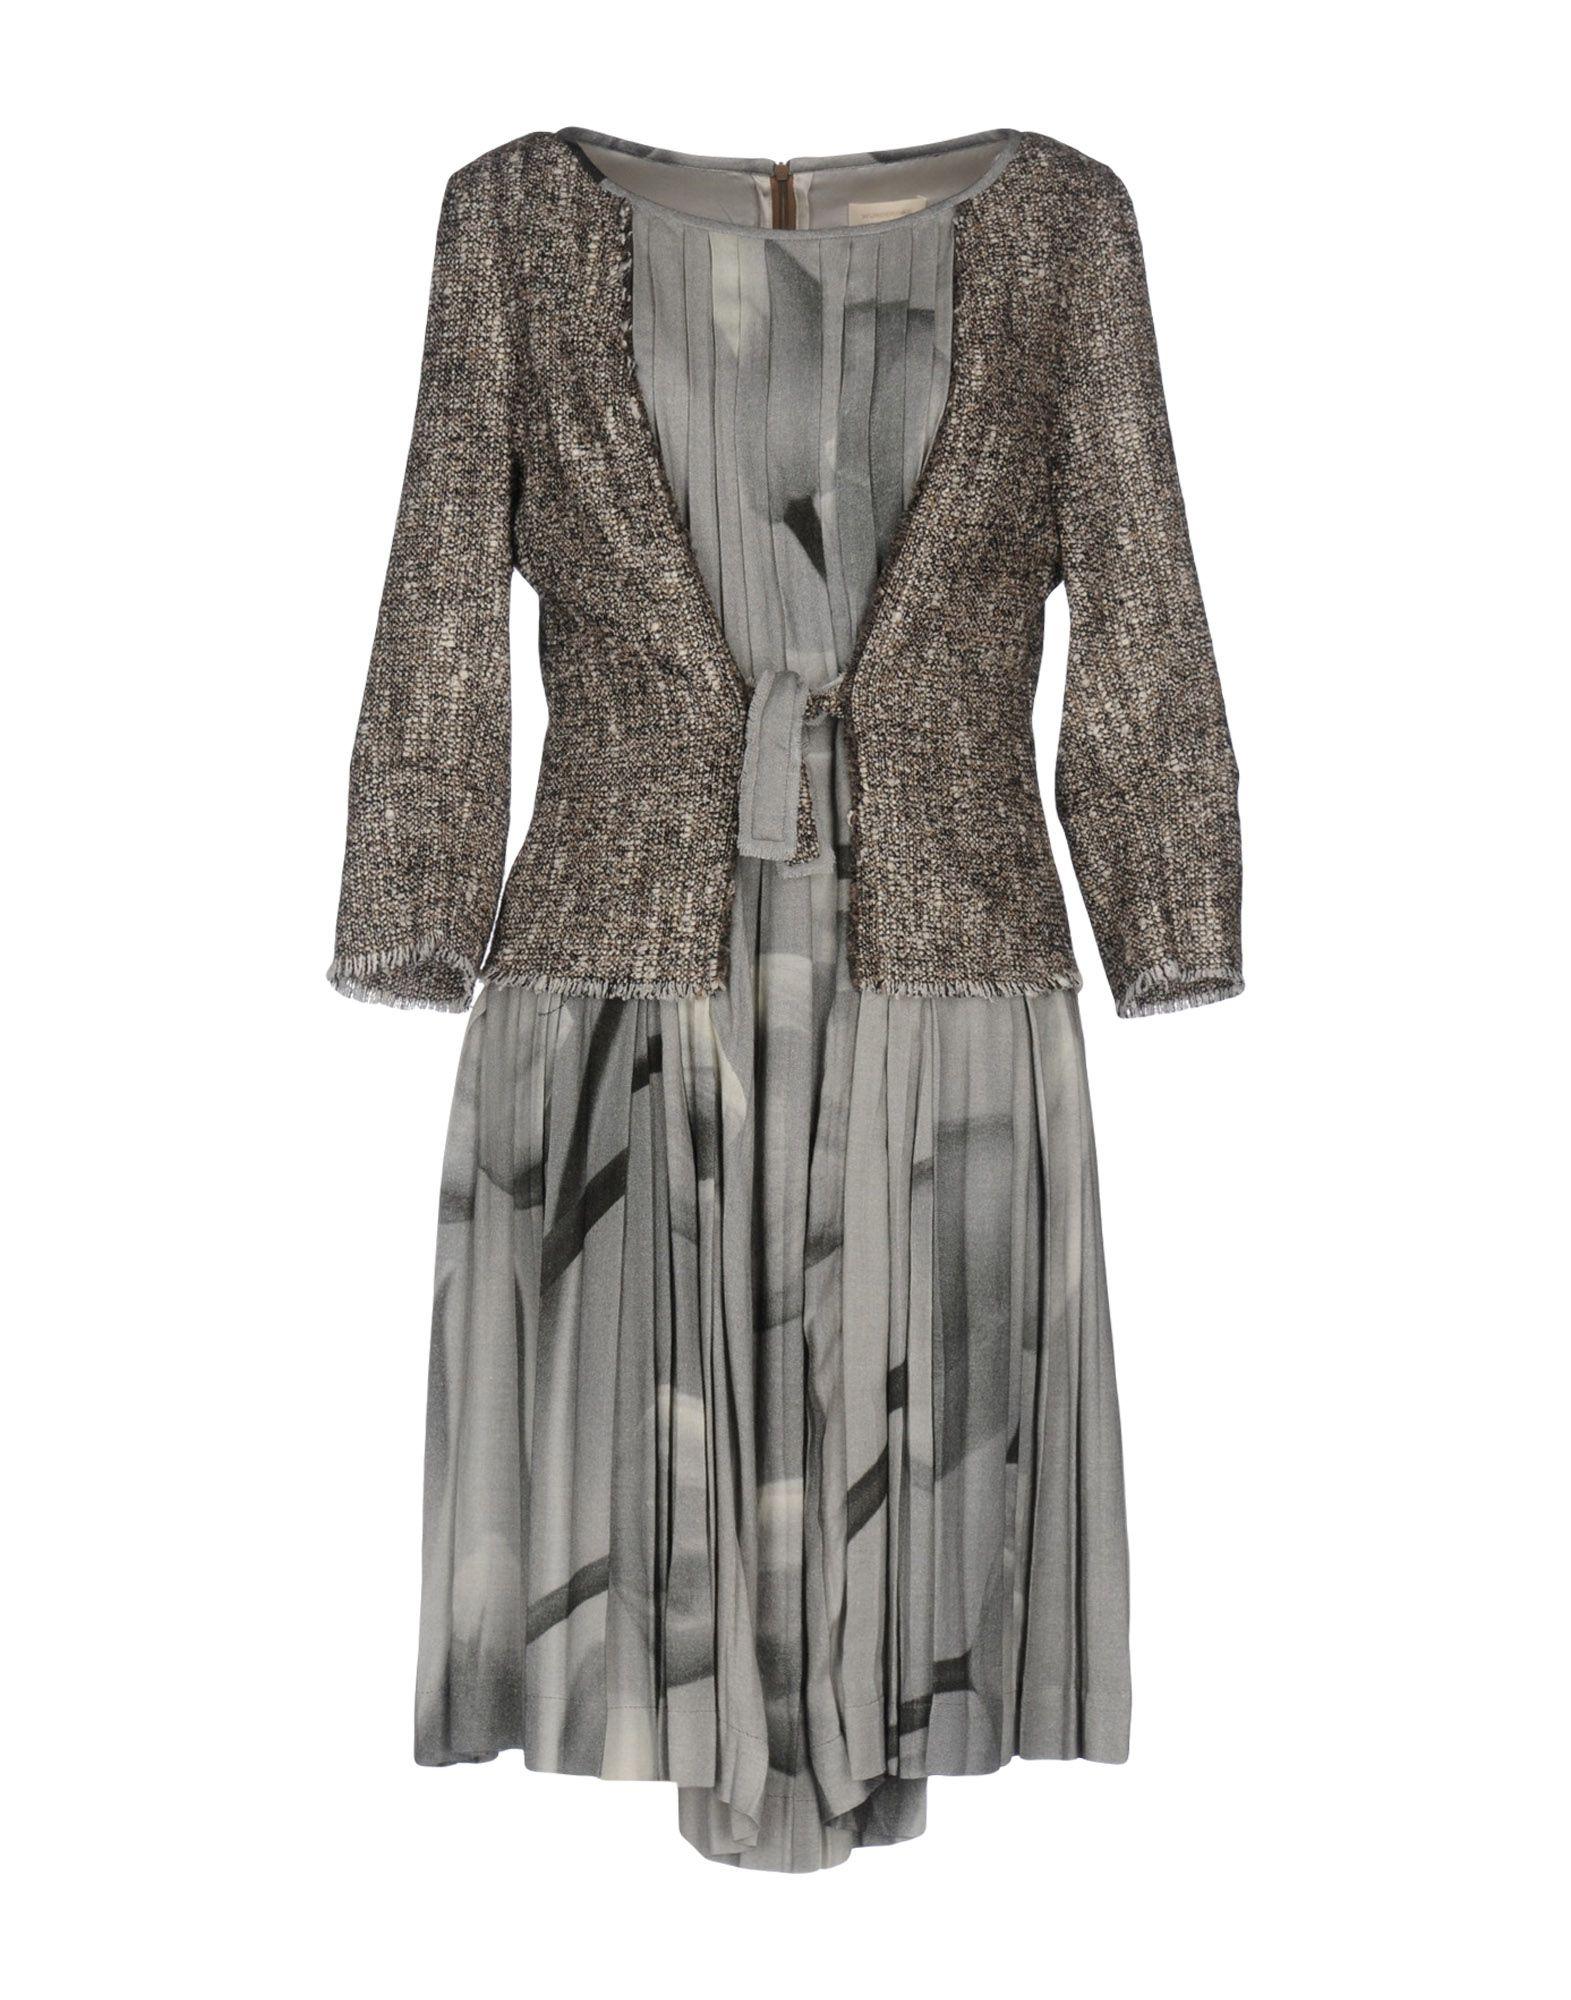 WUNDERKIND Short Dress in Light Grey